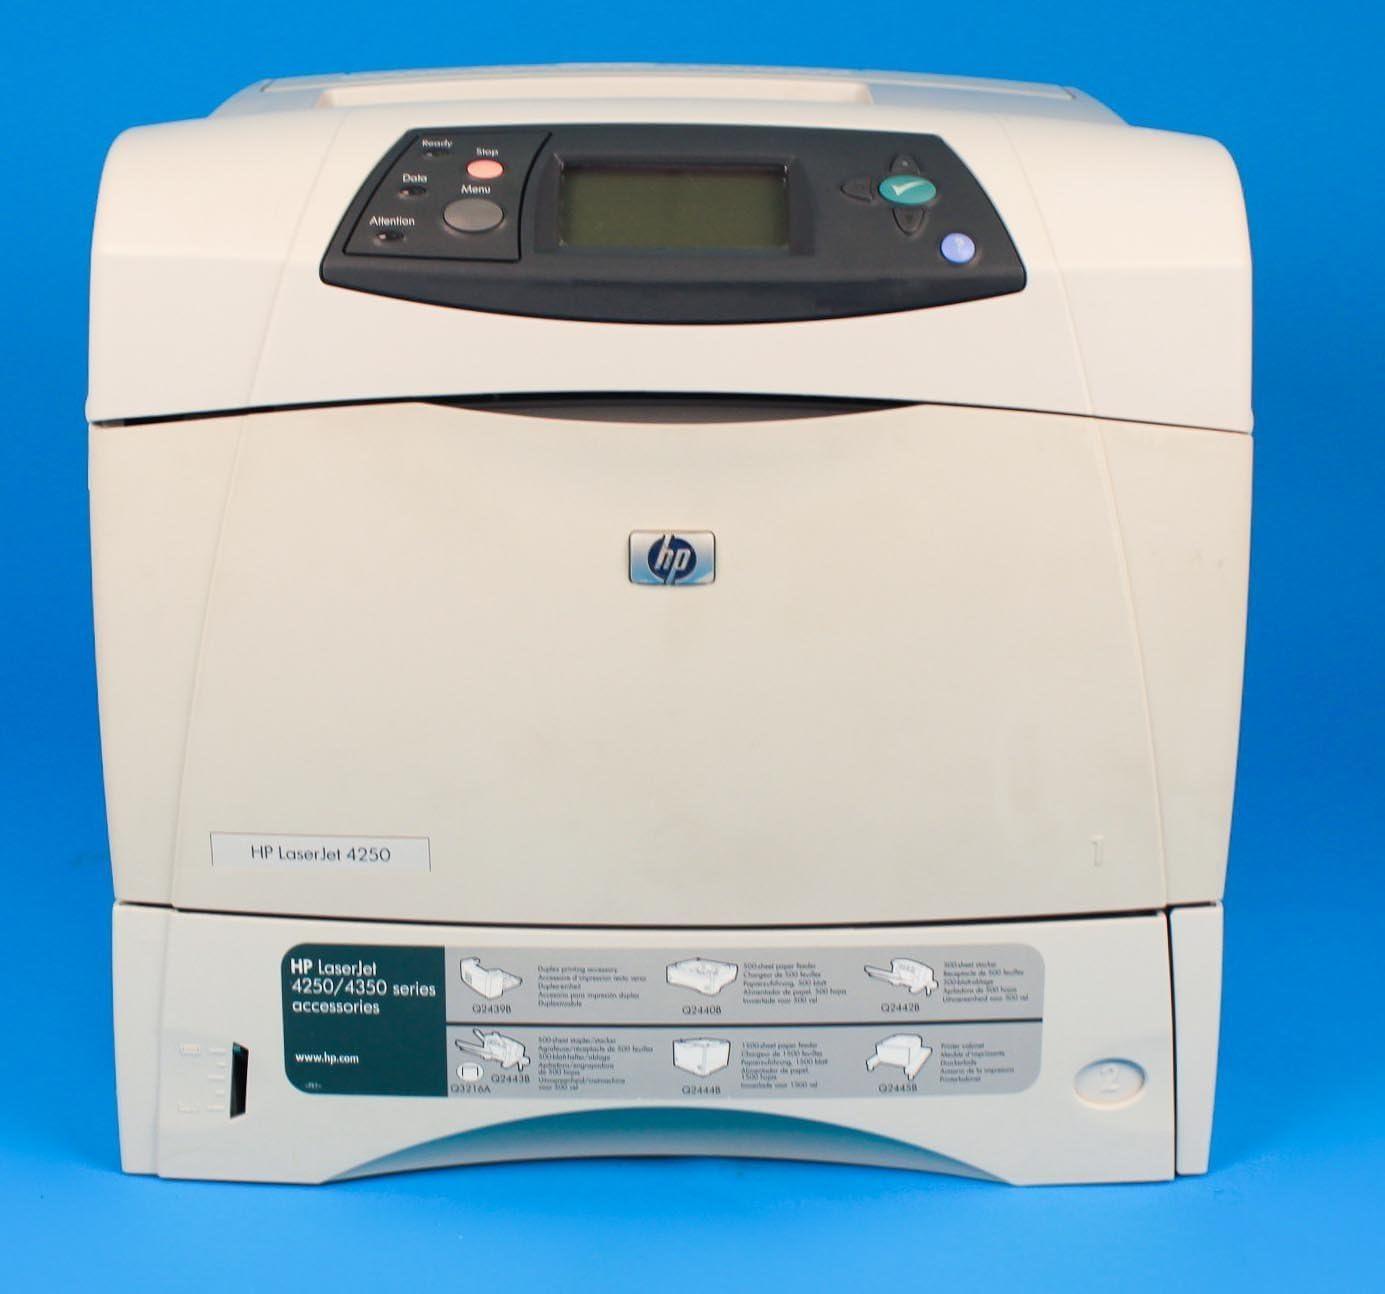 Renewed HP LaserJet 4350N 4350 Q5407A Laser Printer with 90-day Warranty